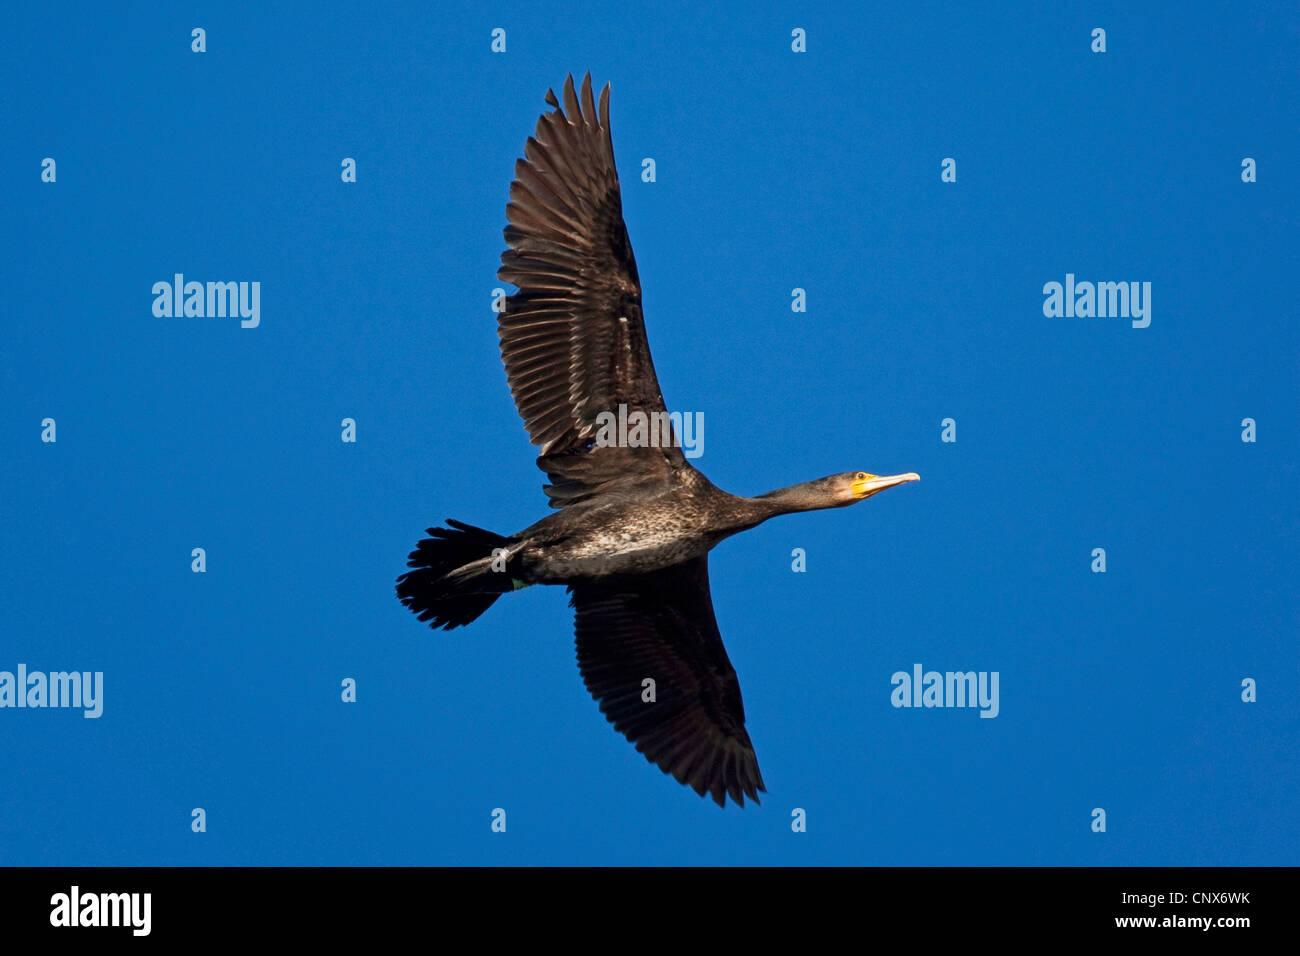 great cormorant (Phalacrocorax carbo), flying, Germany - Stock Image